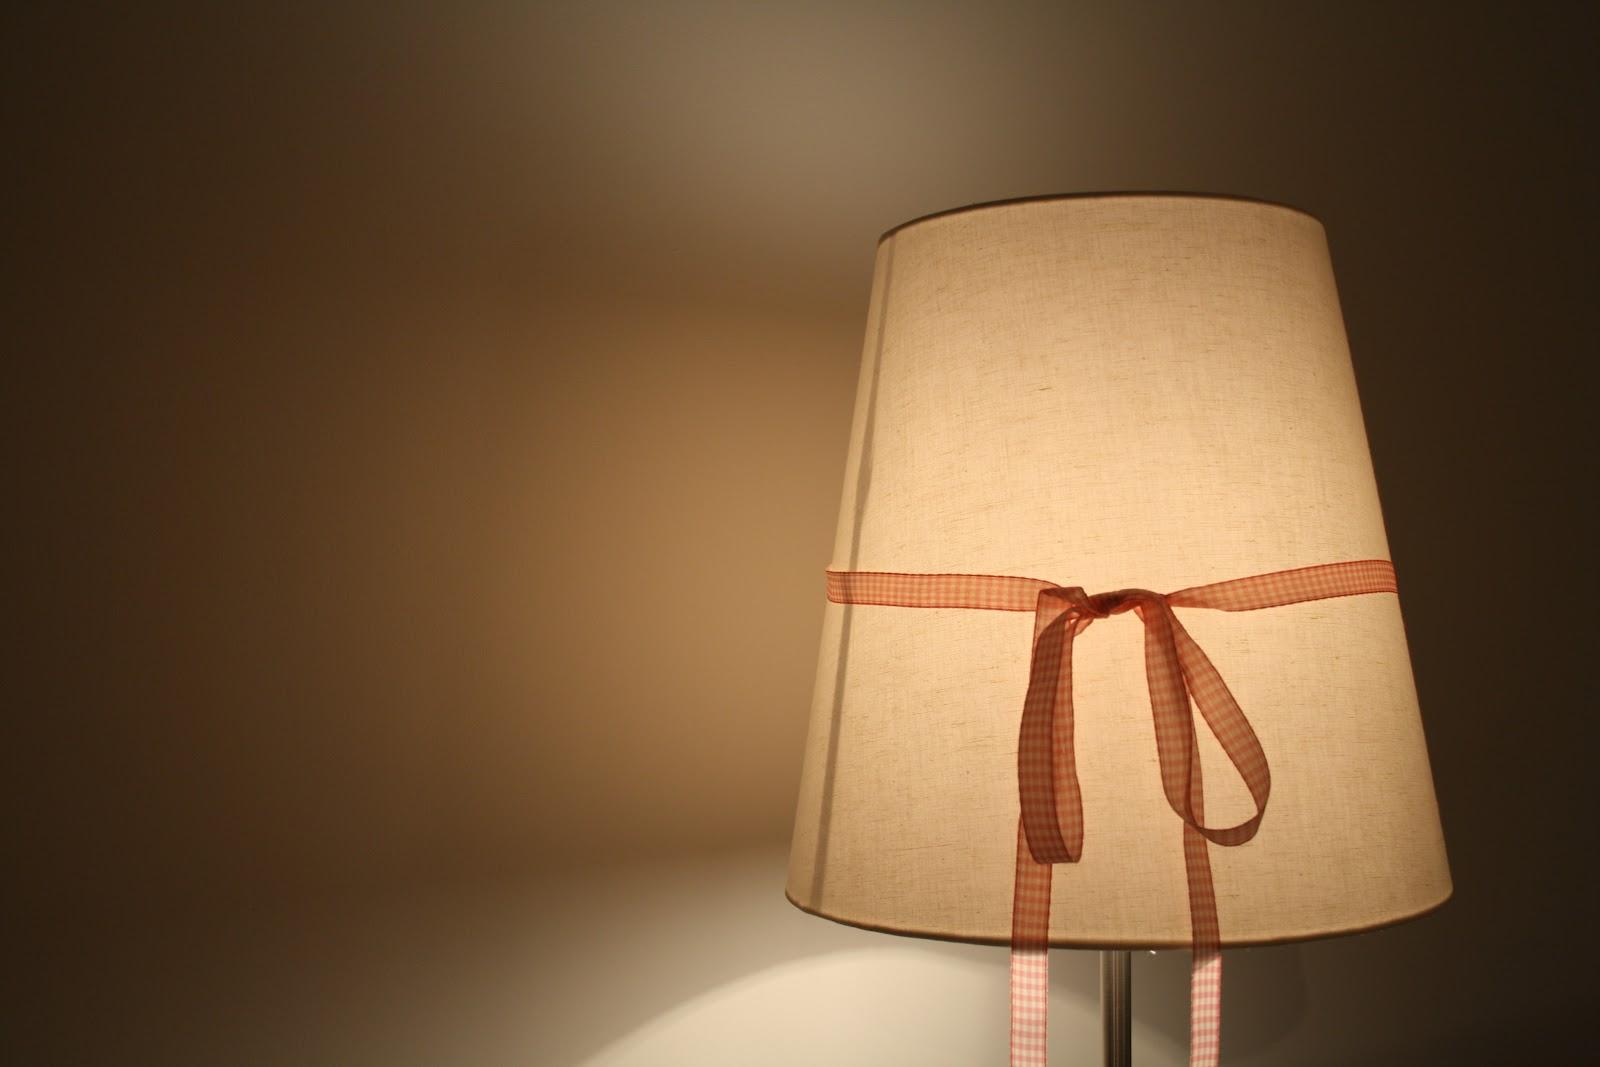 pimp my lampenschirm deko hoch drei. Black Bedroom Furniture Sets. Home Design Ideas